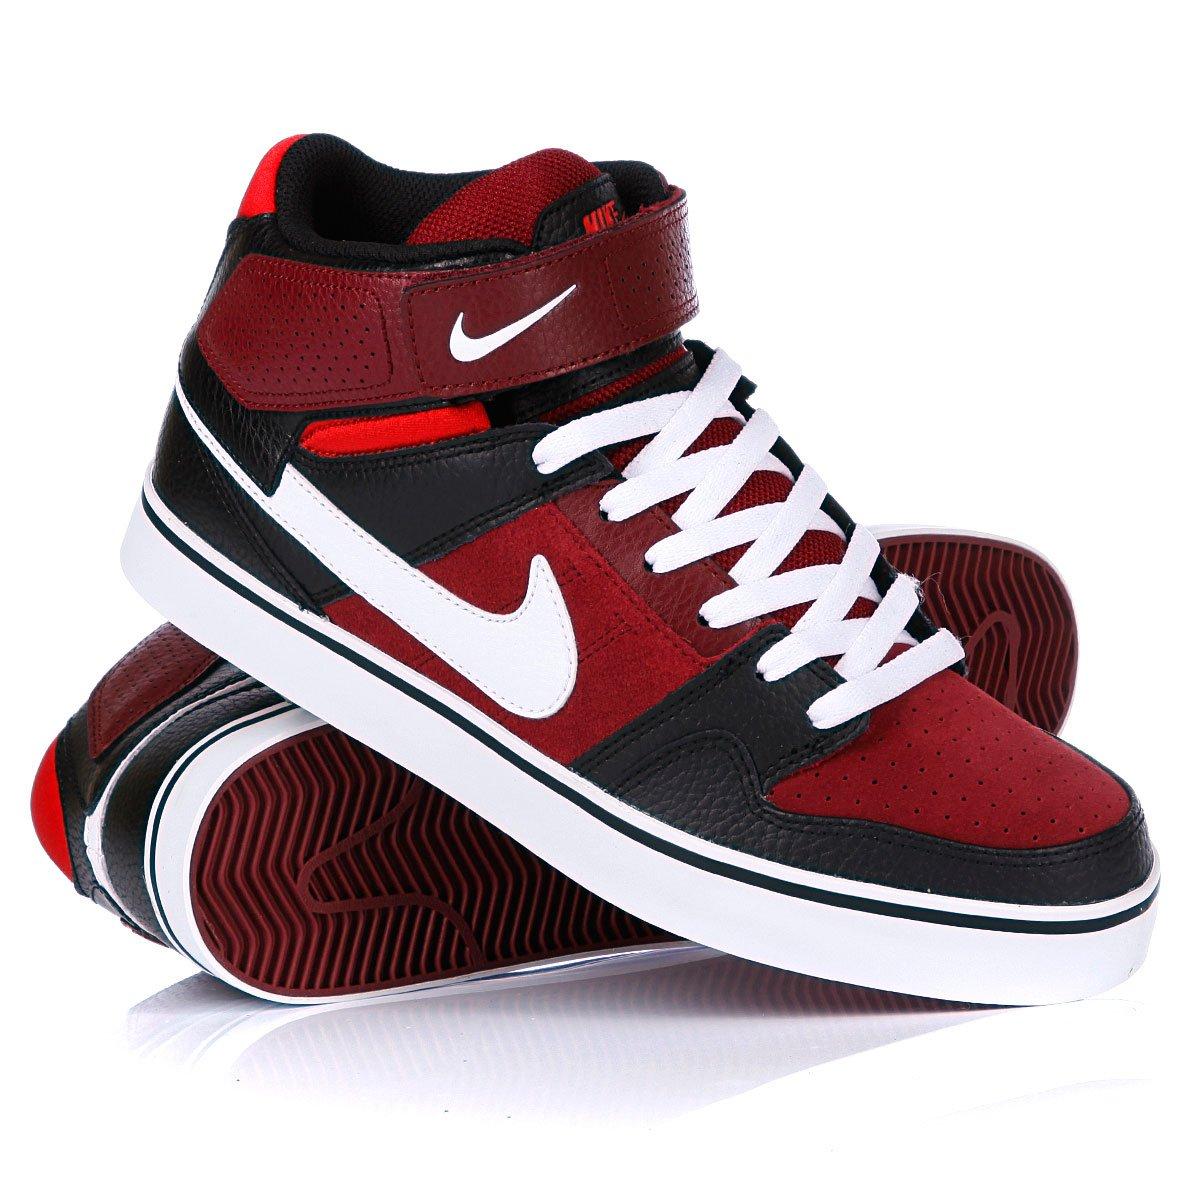 1fee91082aab Купить кеды высокие Nike Mogan Mid 2 SE Team Red White (487944-610 ...